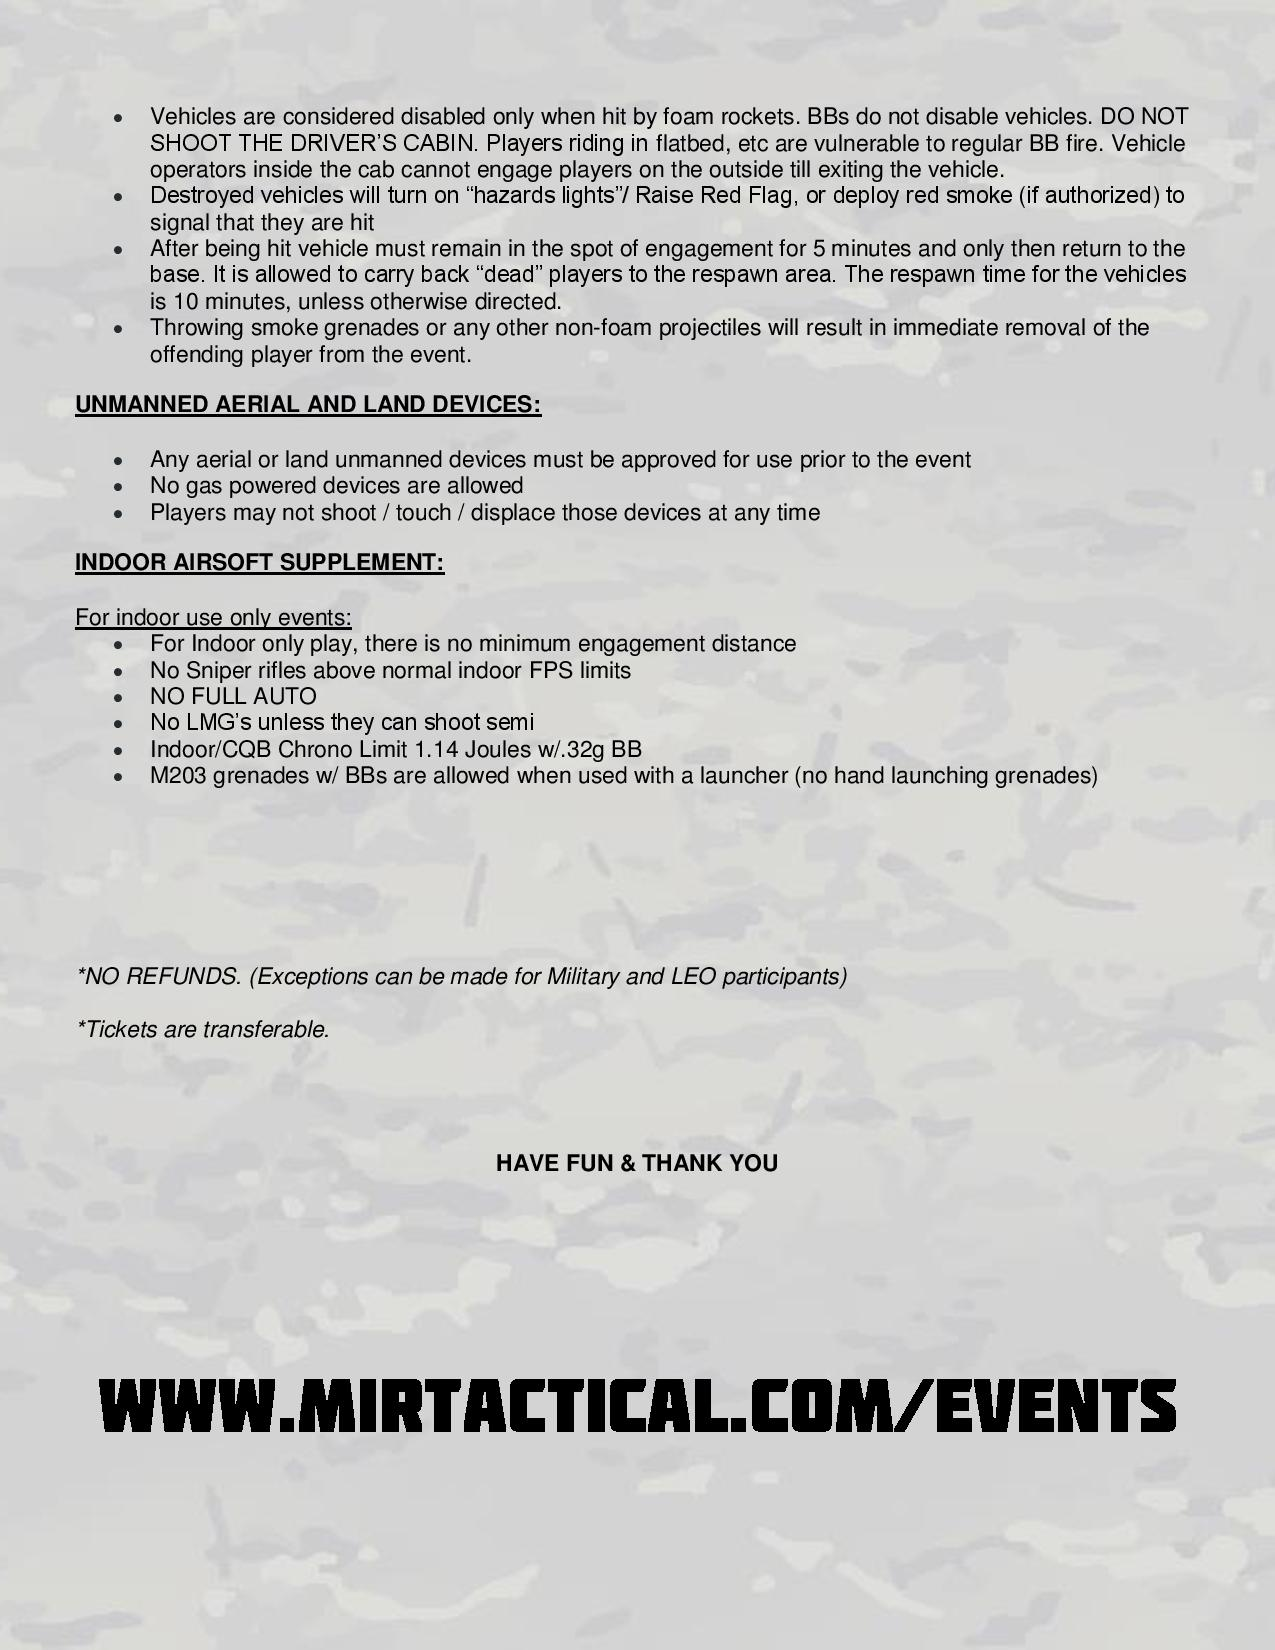 mir-tactical-strikeball-airsoft-sop-v1.1-page-006.jpg